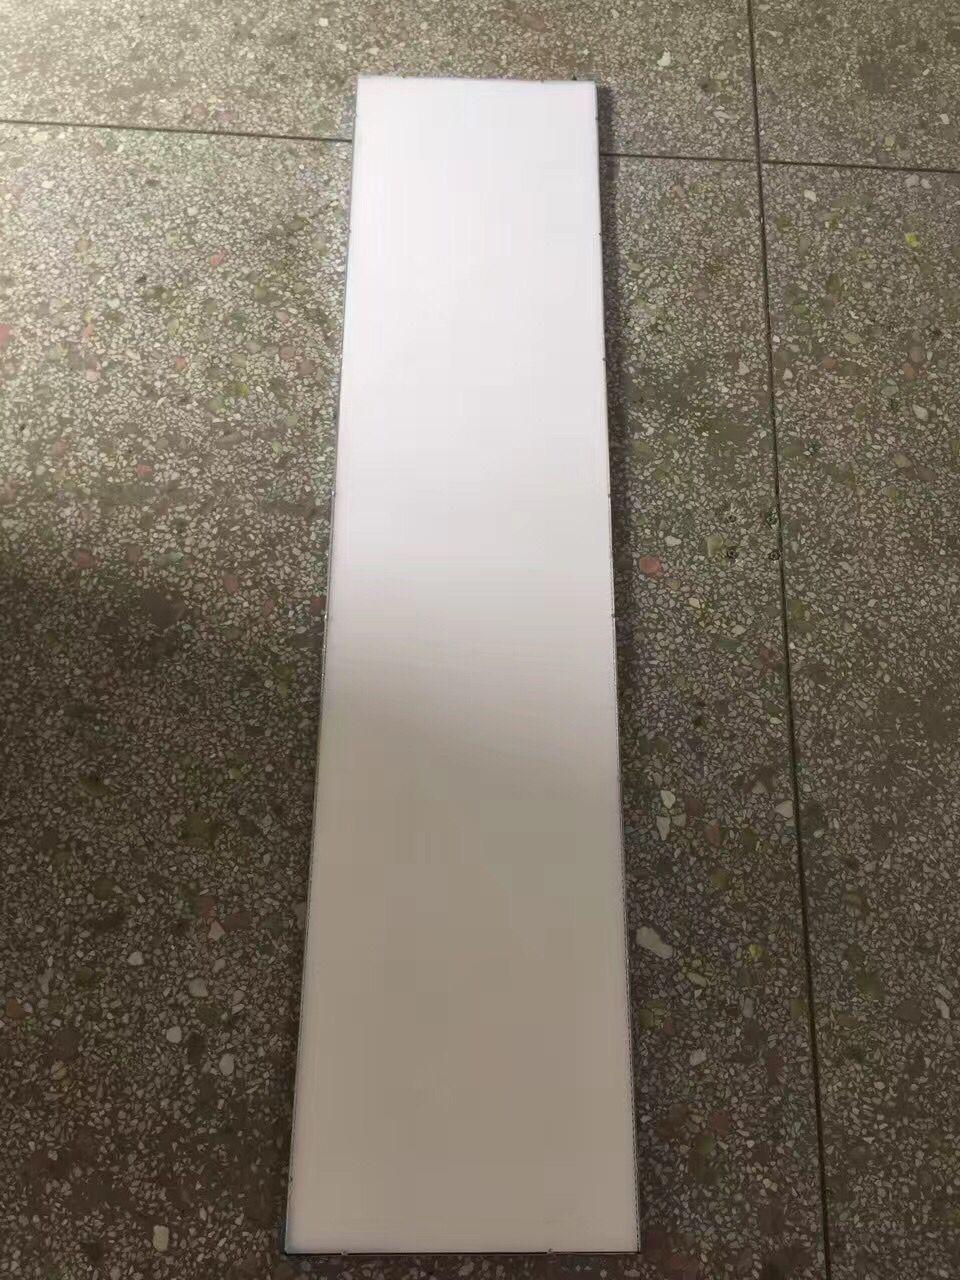 No Border Panel Light 300*600*8mm